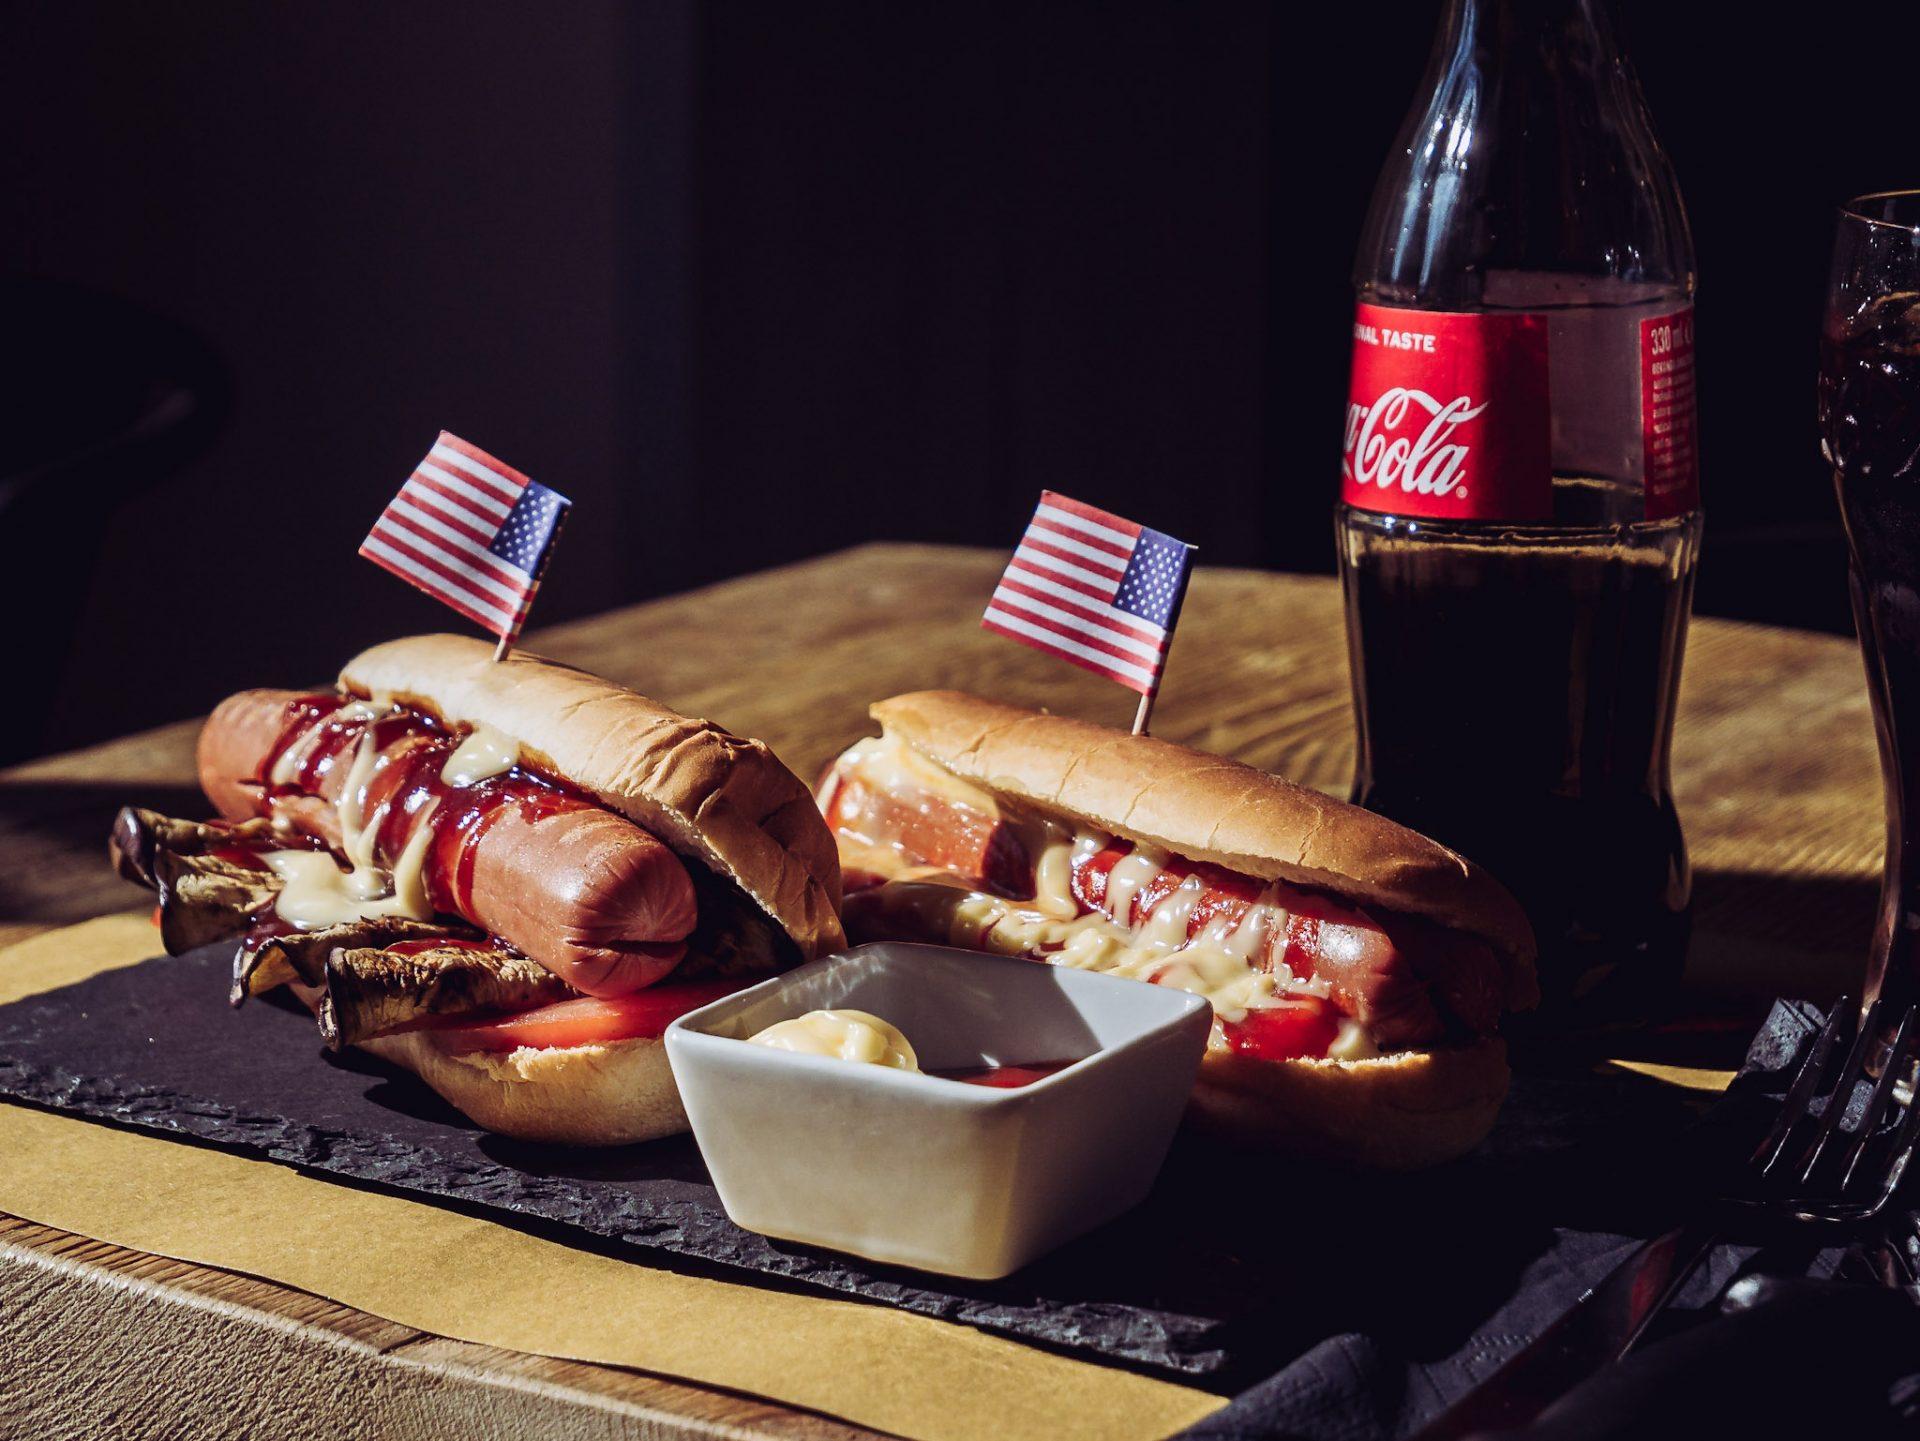 bar_recine_velletri_ristorante_bistrot_enoteca_tabaccheria_hamburgeria_panini_pub_hot_dog